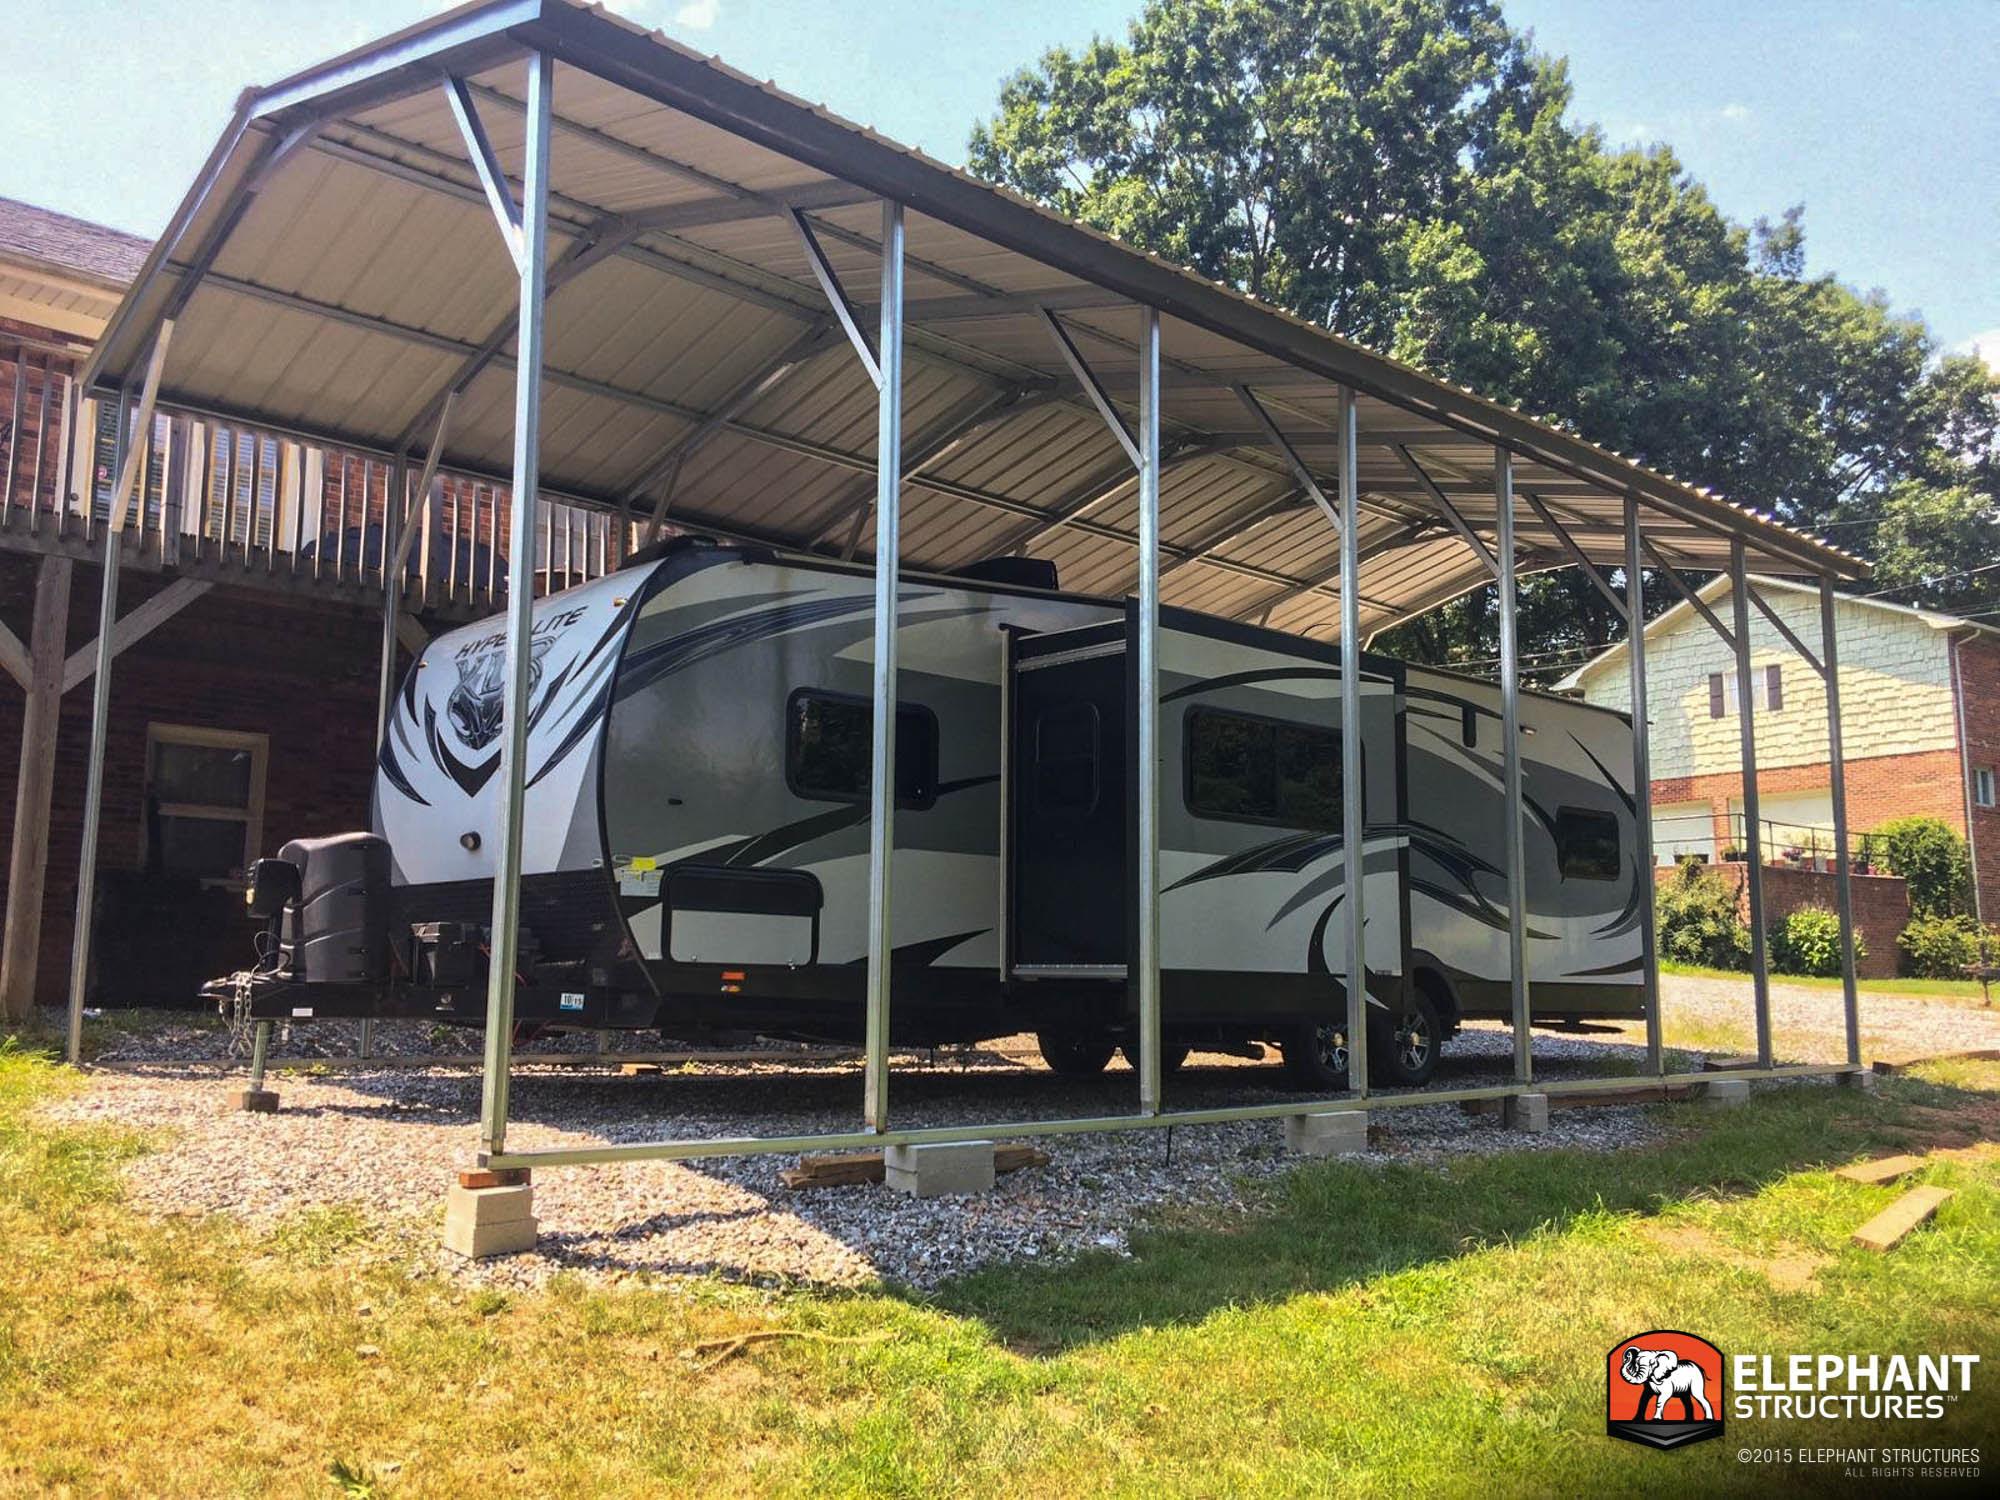 RV Carport - Metal SheltersMetal Shelters